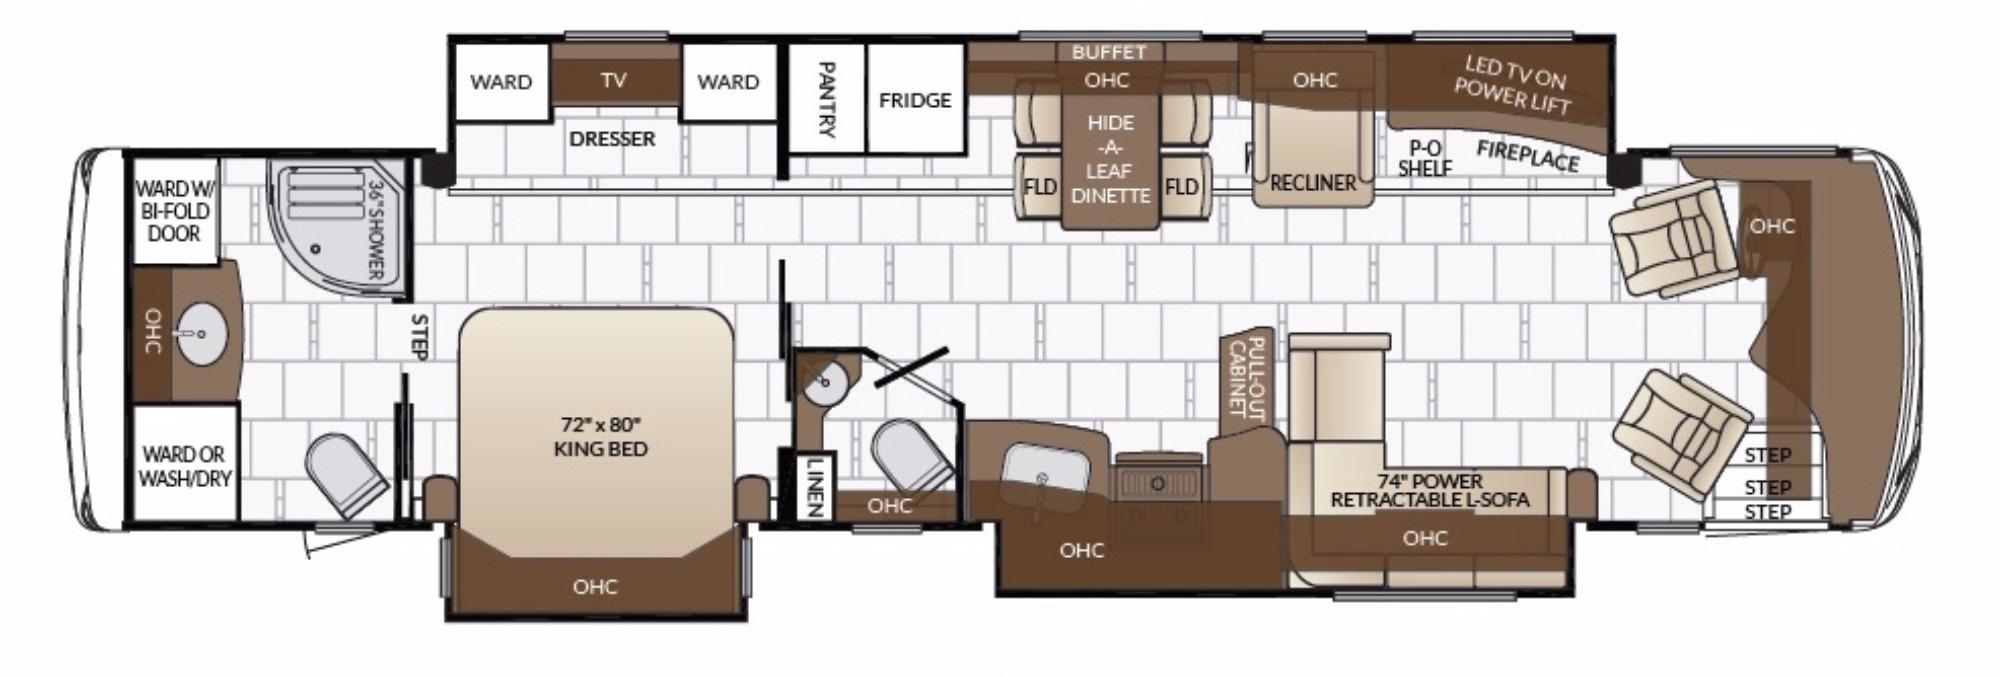 View Floor Plan for 2017 NEWMAR DUTCH STAR 4018